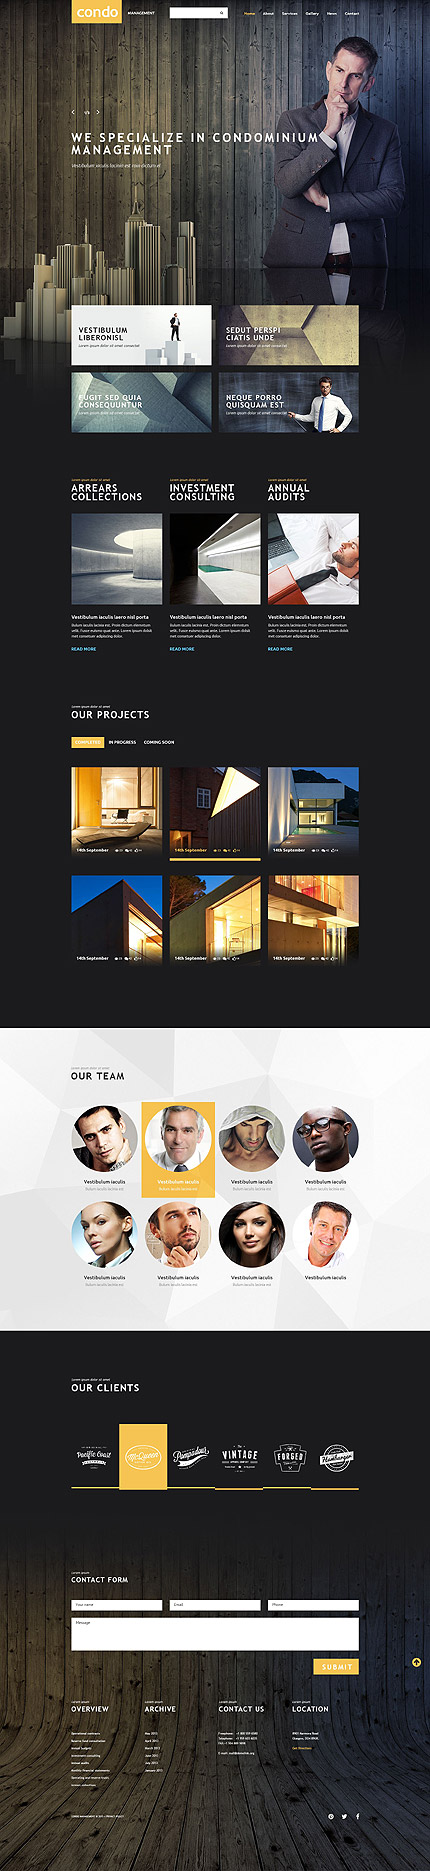 Website Template #54015